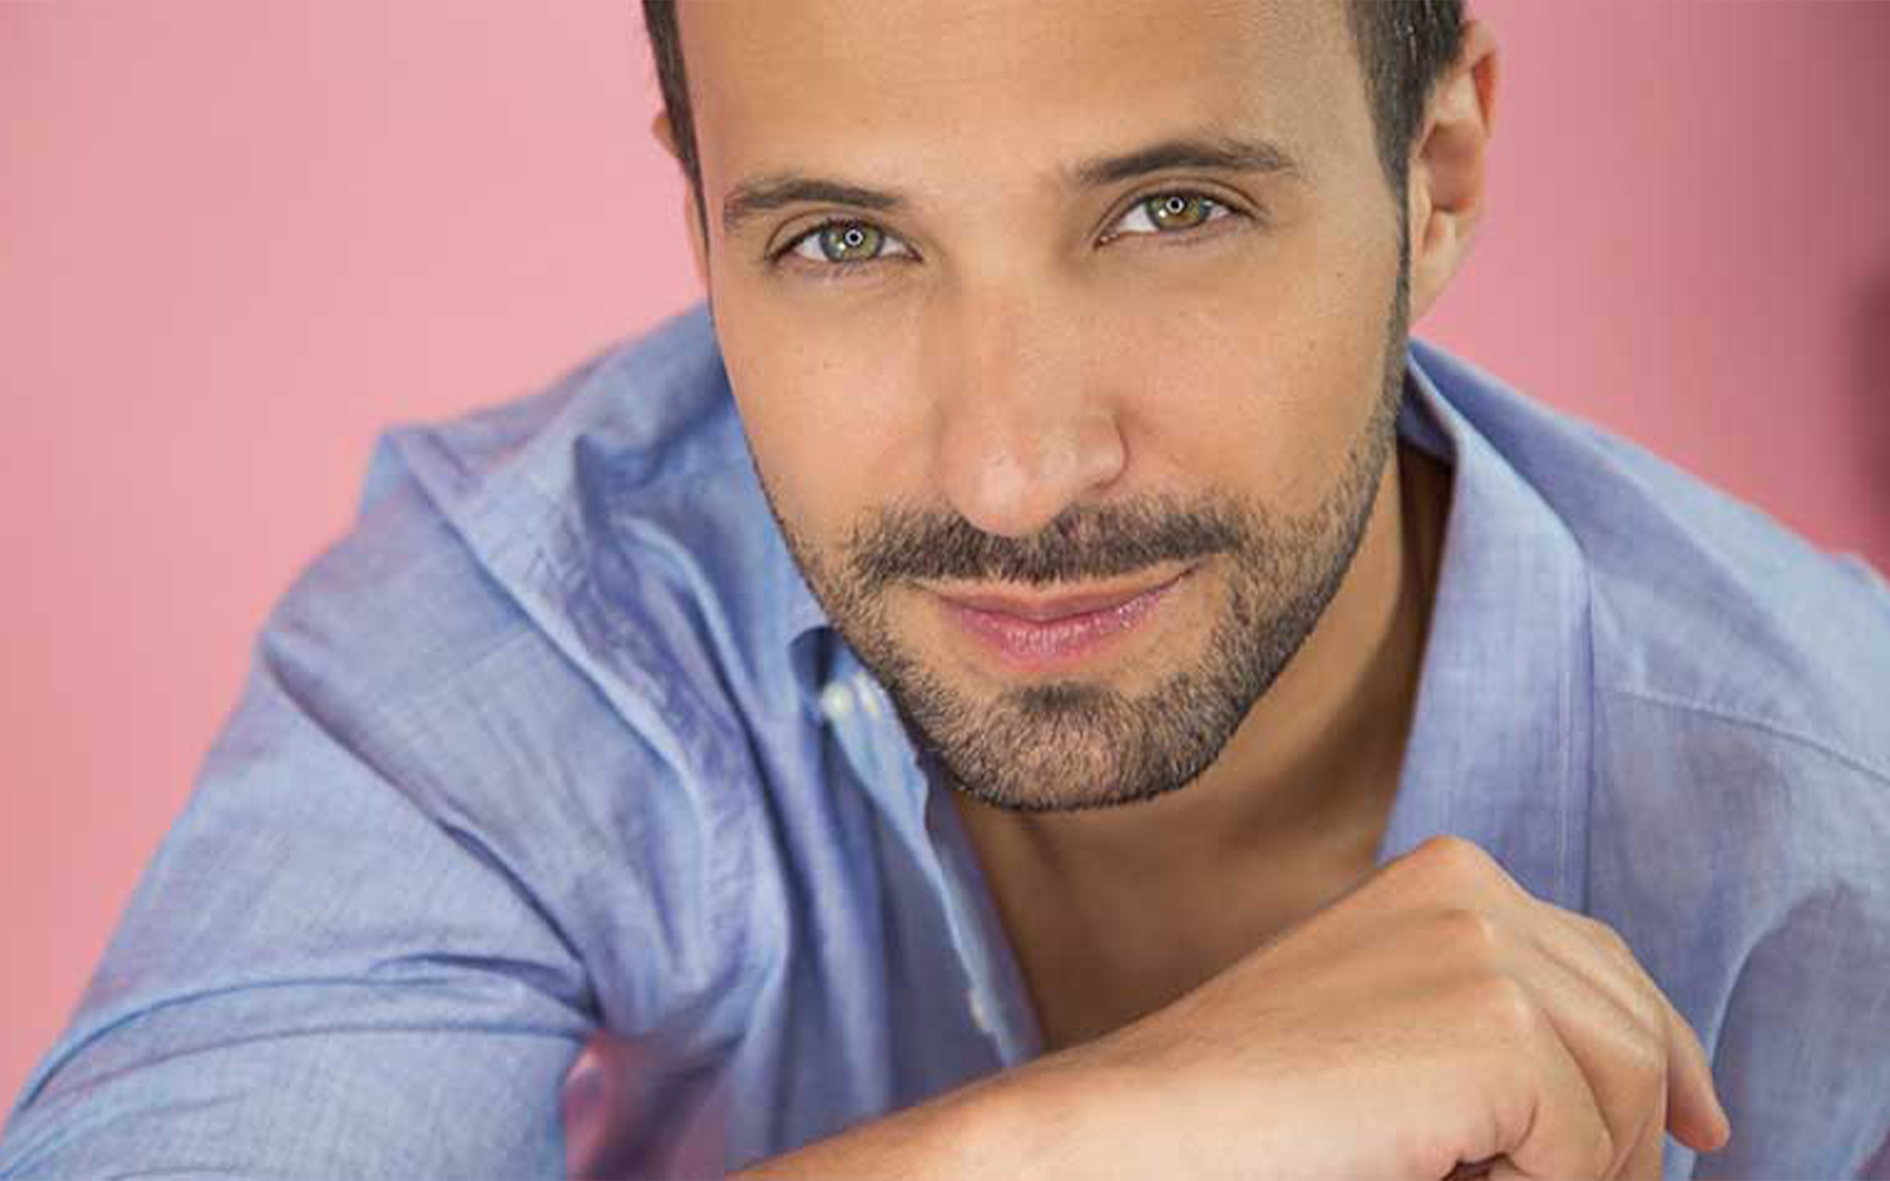 Rodrigo Massa: Actor By Day, Pop Star By Night